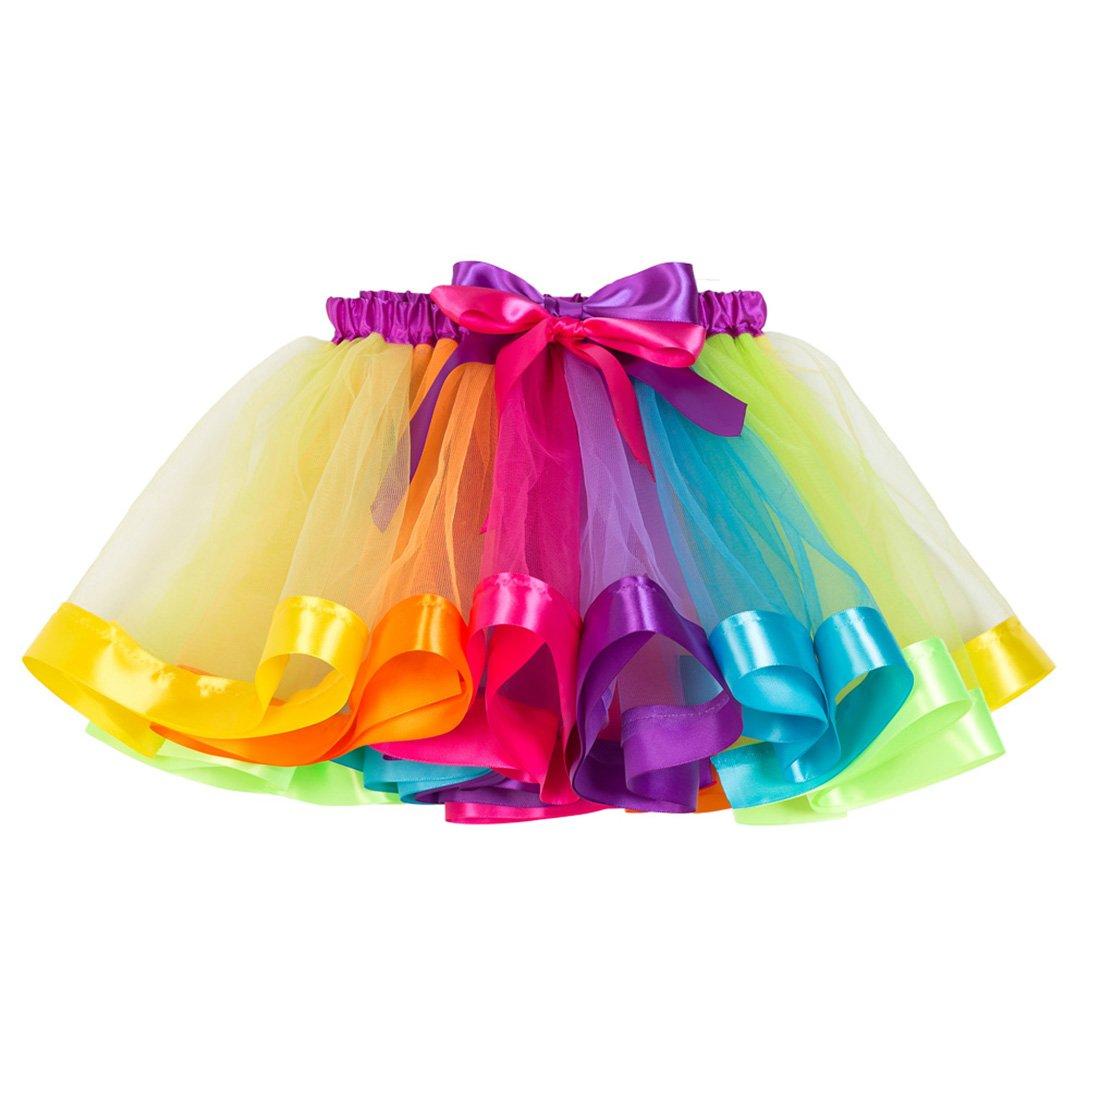 NEXLOMOS Girls Colorful Rainbow Layered Ribbon Tiered Ballet Tutu Skirt